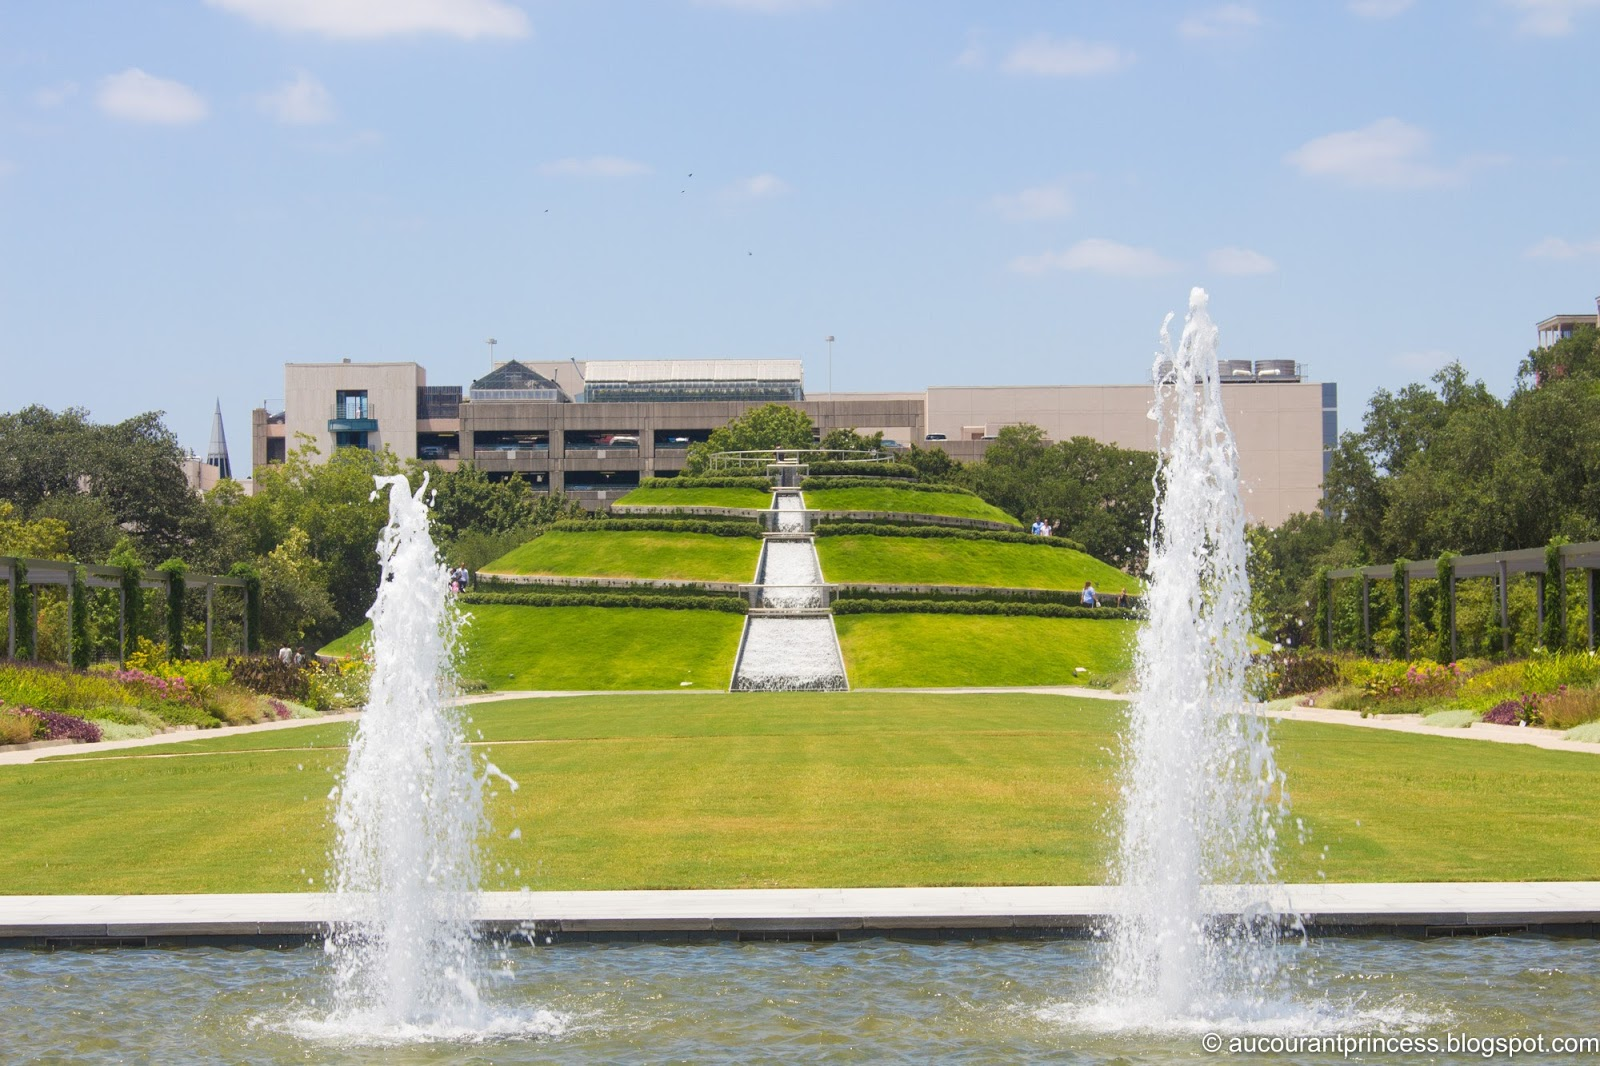 Cherie Flores Garden Pavilion: Things To Do in Houston, Texas, USA